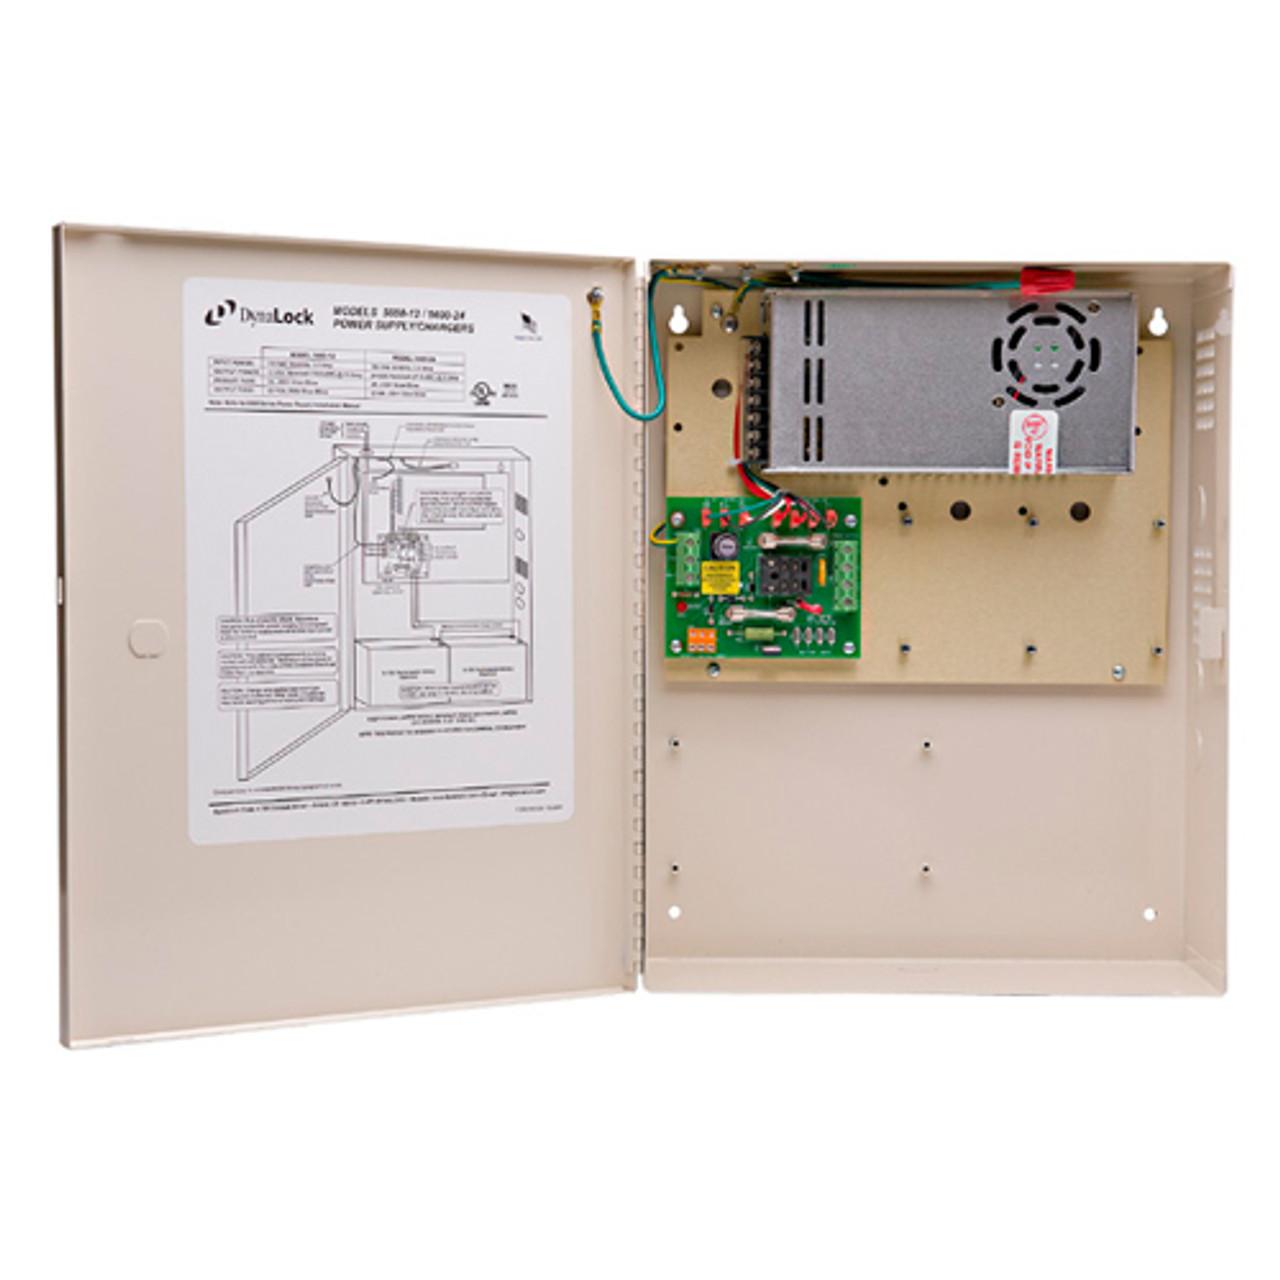 medium resolution of 5600 12 ilb dynalock multi zone heavy duty 12 vdc power supply with interlock logic board lock depot inc